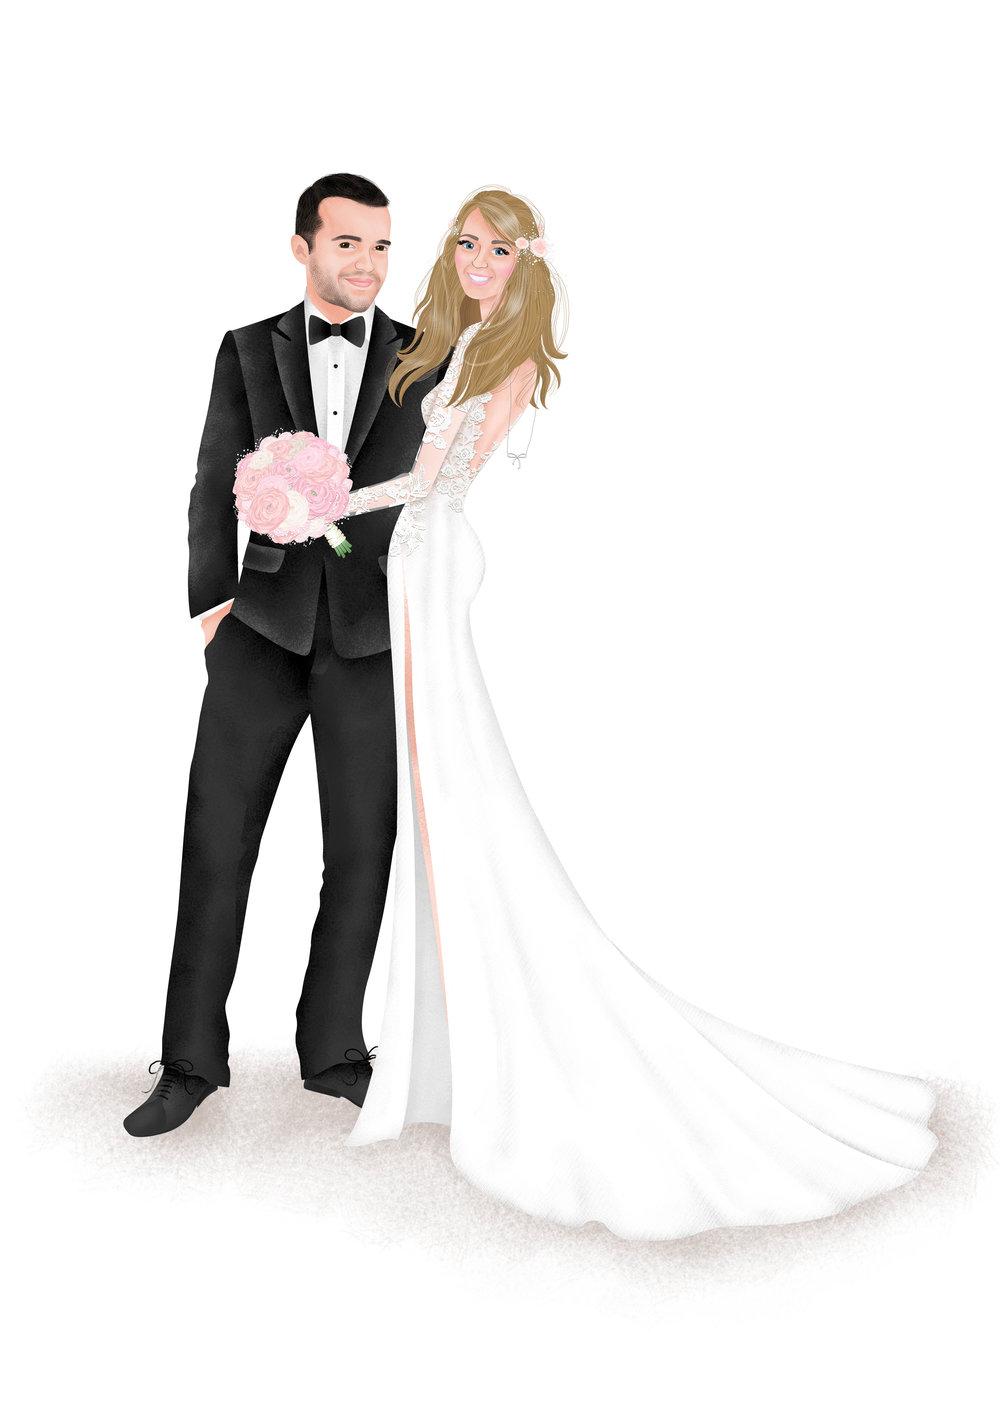 SARAH CLUNEY - BRIDE AND GROOM day - A2.jpg